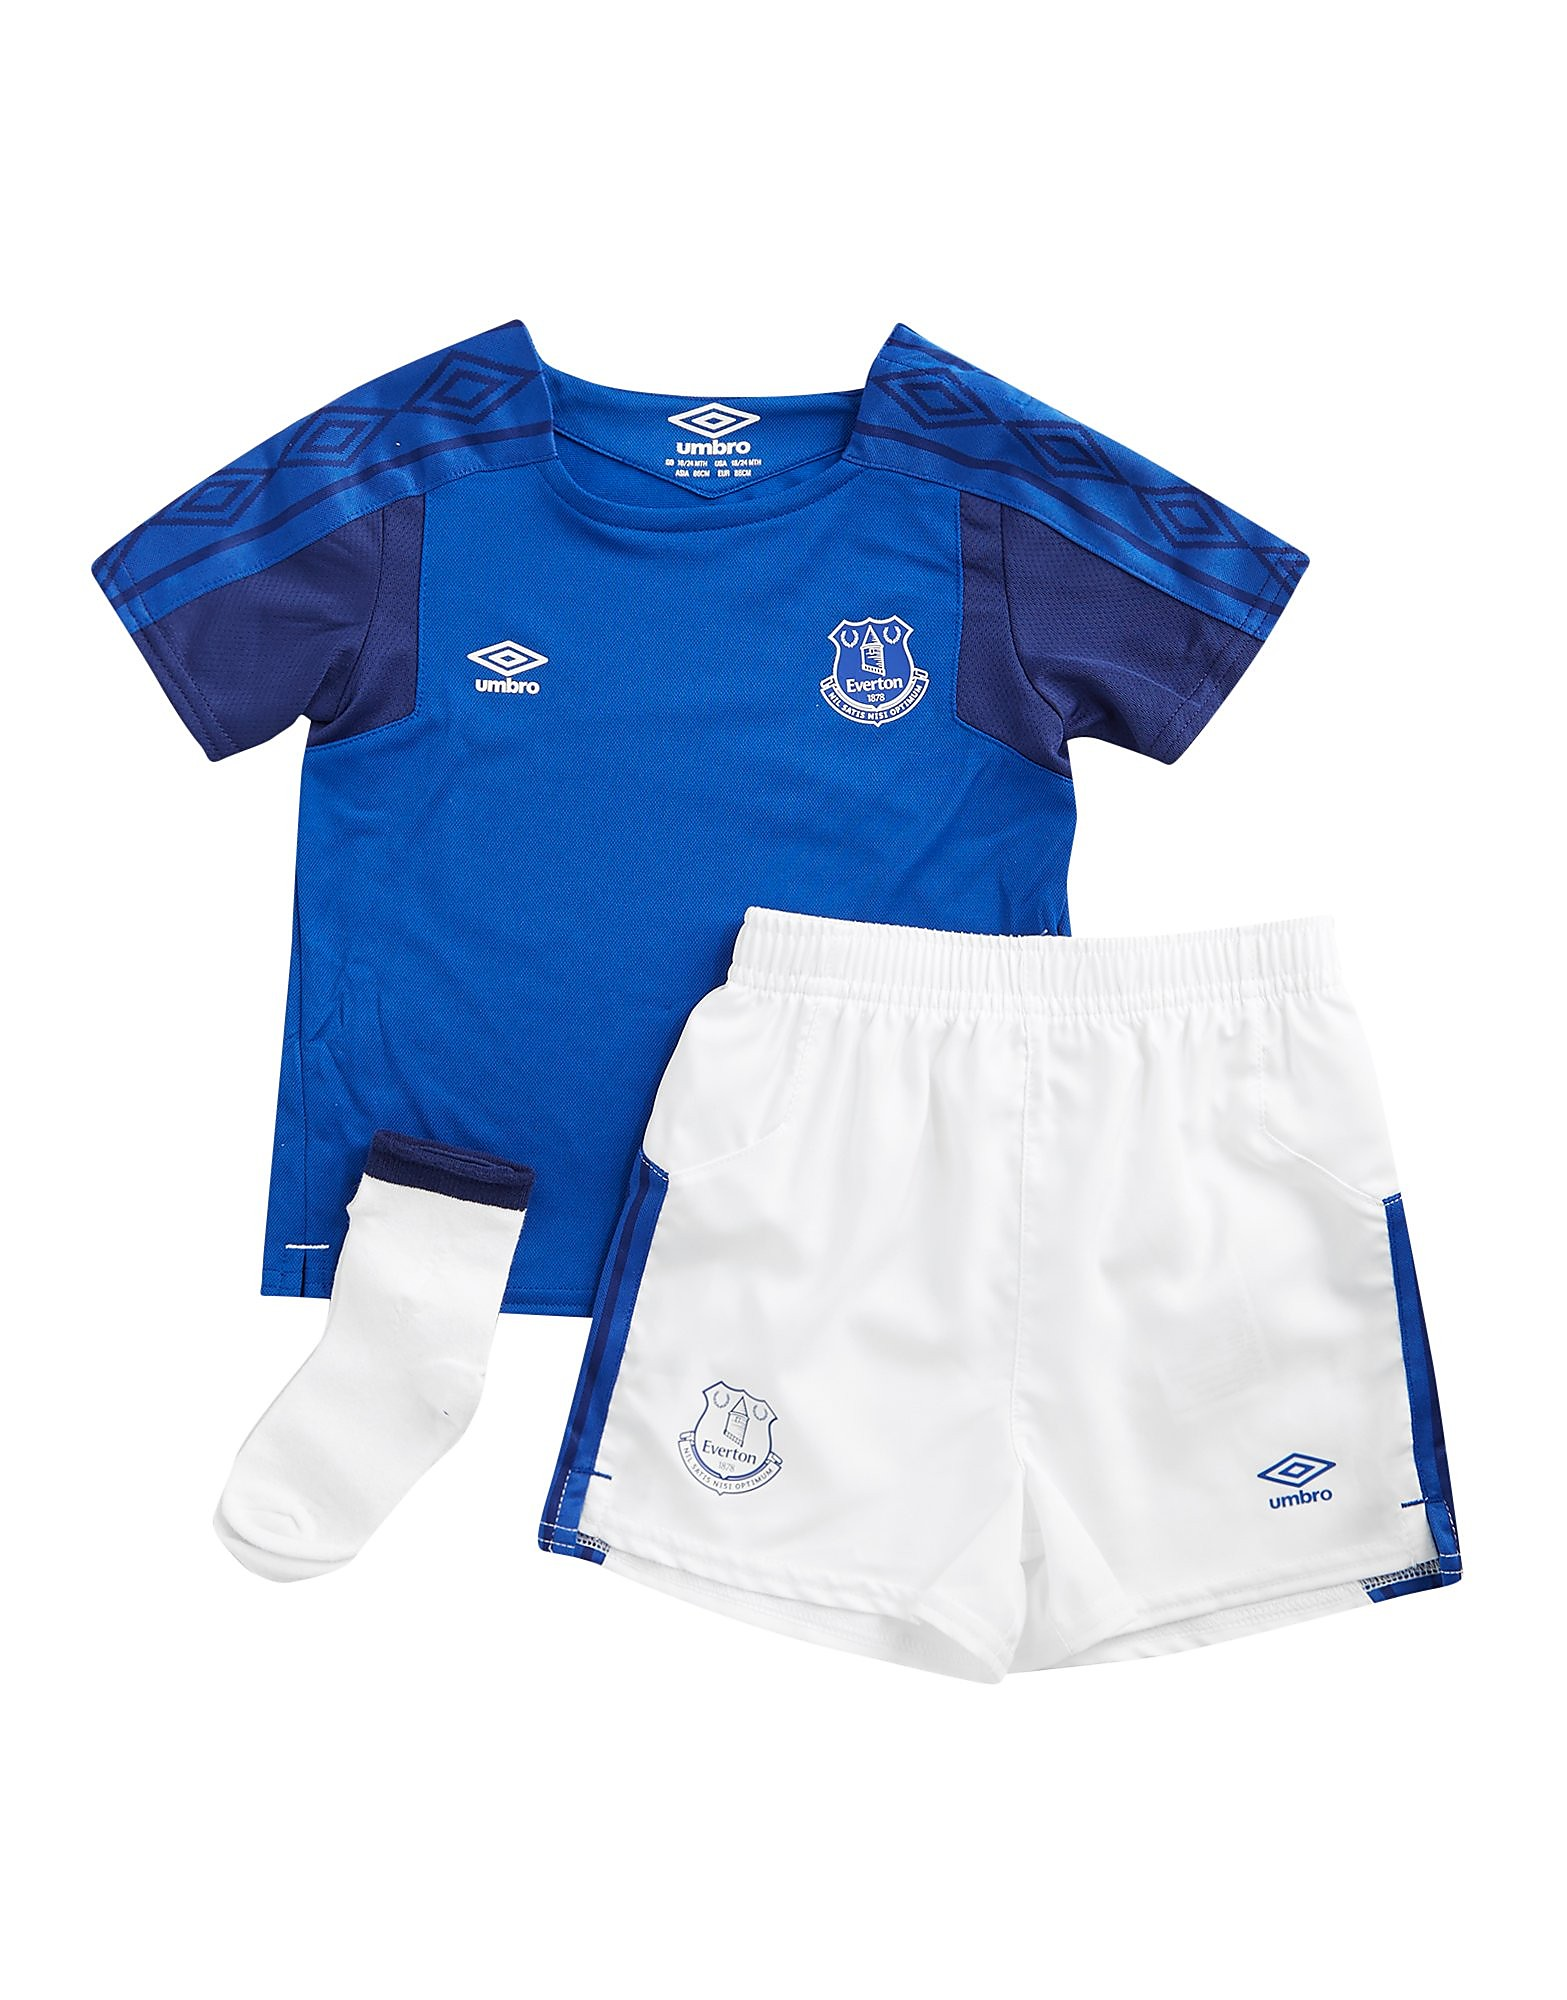 Umbro Everton FC 2017/18 Home Kit Infant